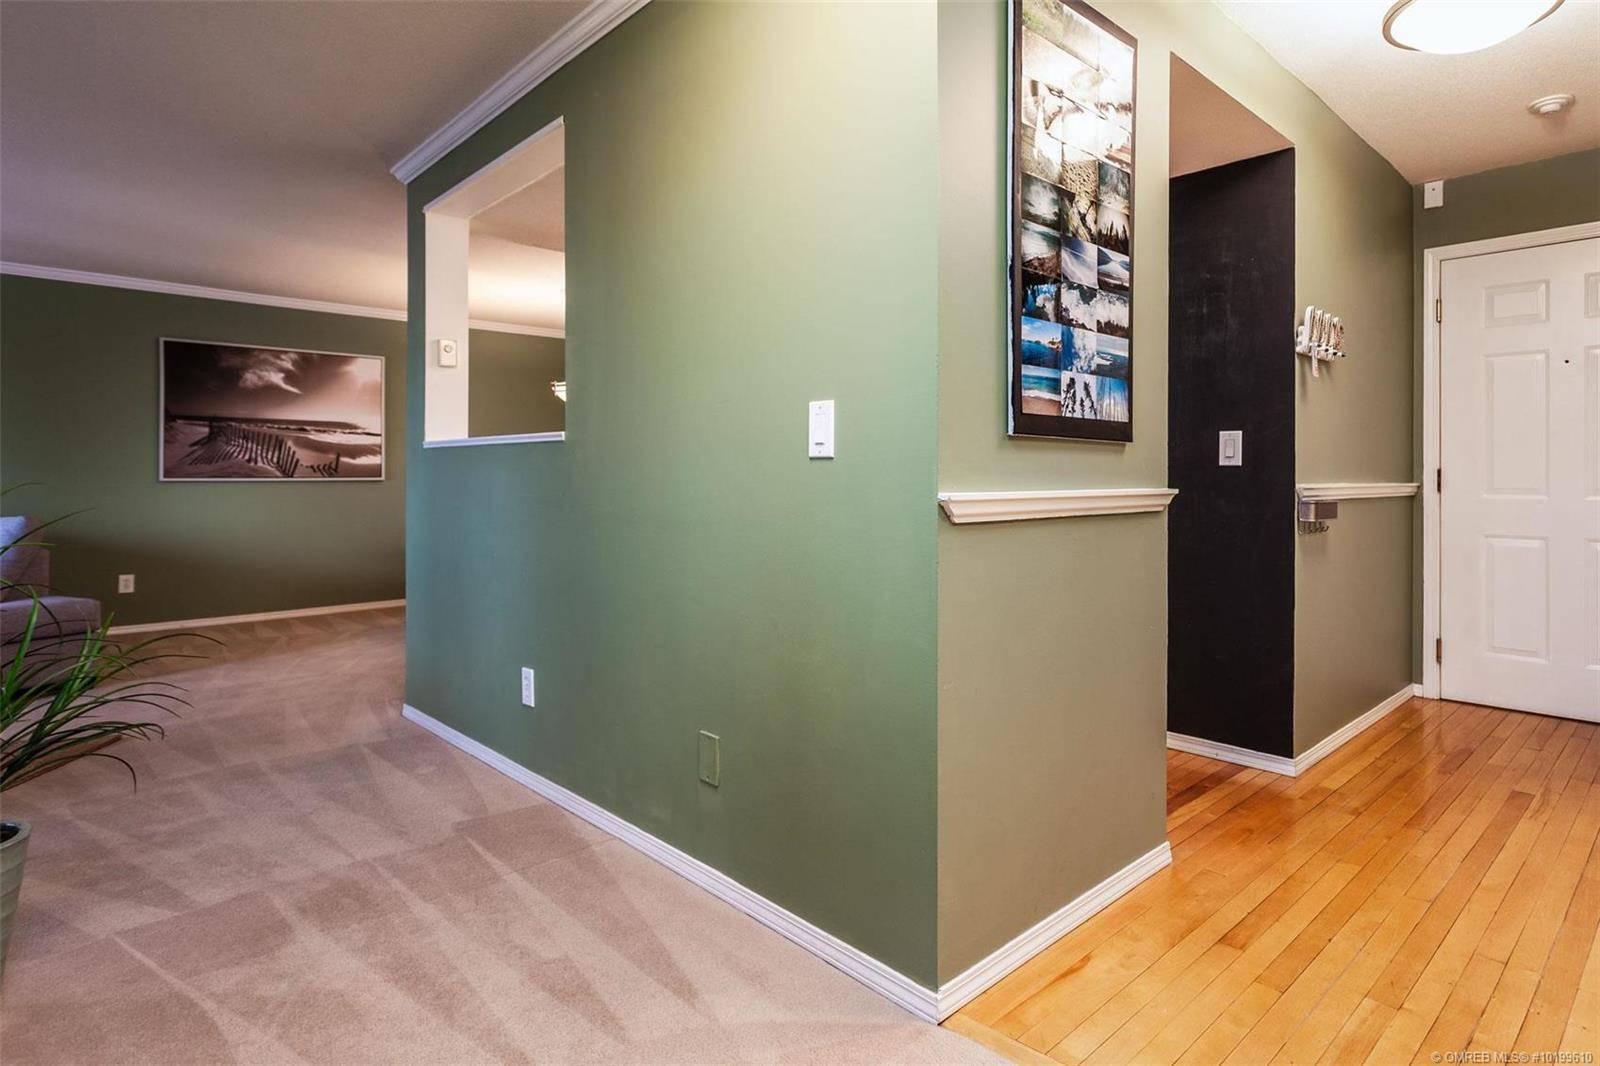 Condo for sale at 3175 De Montreuil Ct Unit 216 Kelowna British Columbia - MLS: 10199610